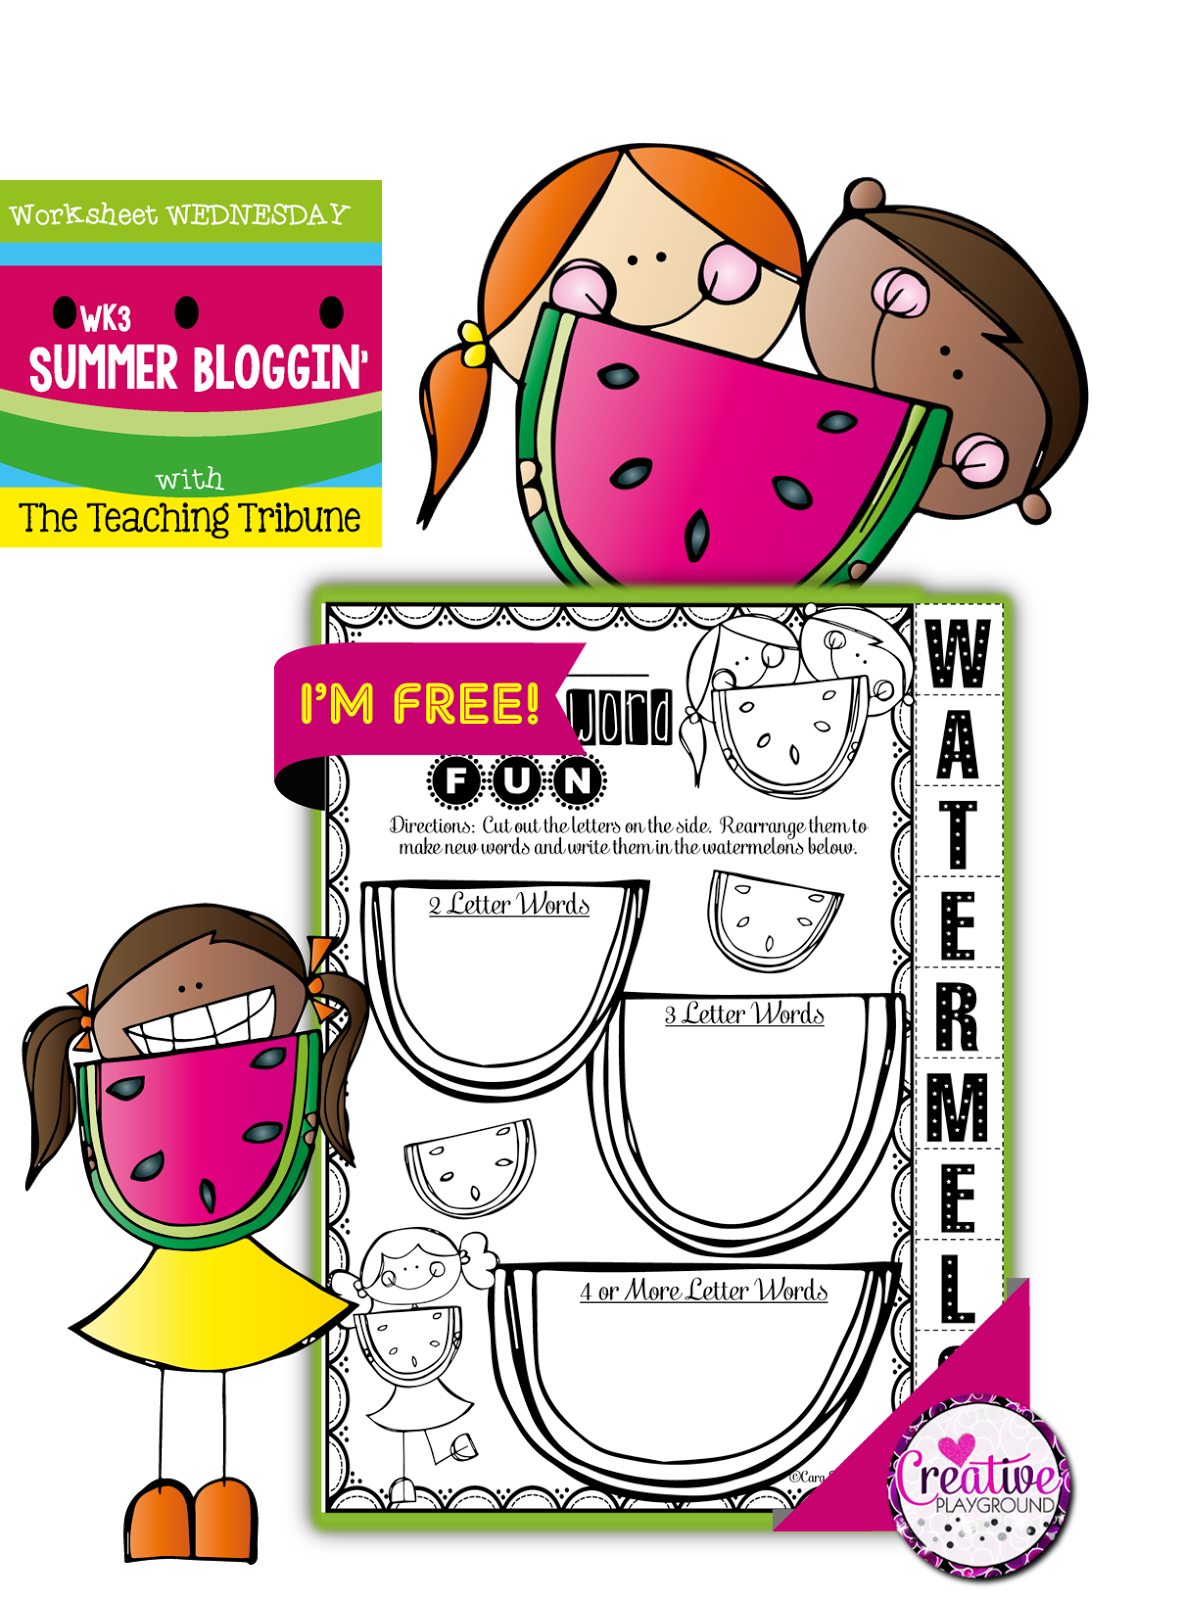 Creative Playground Free Free Free Free Kindergarten Printables Creative Playground Kindergarten Free [ 1600 x 1182 Pixel ]